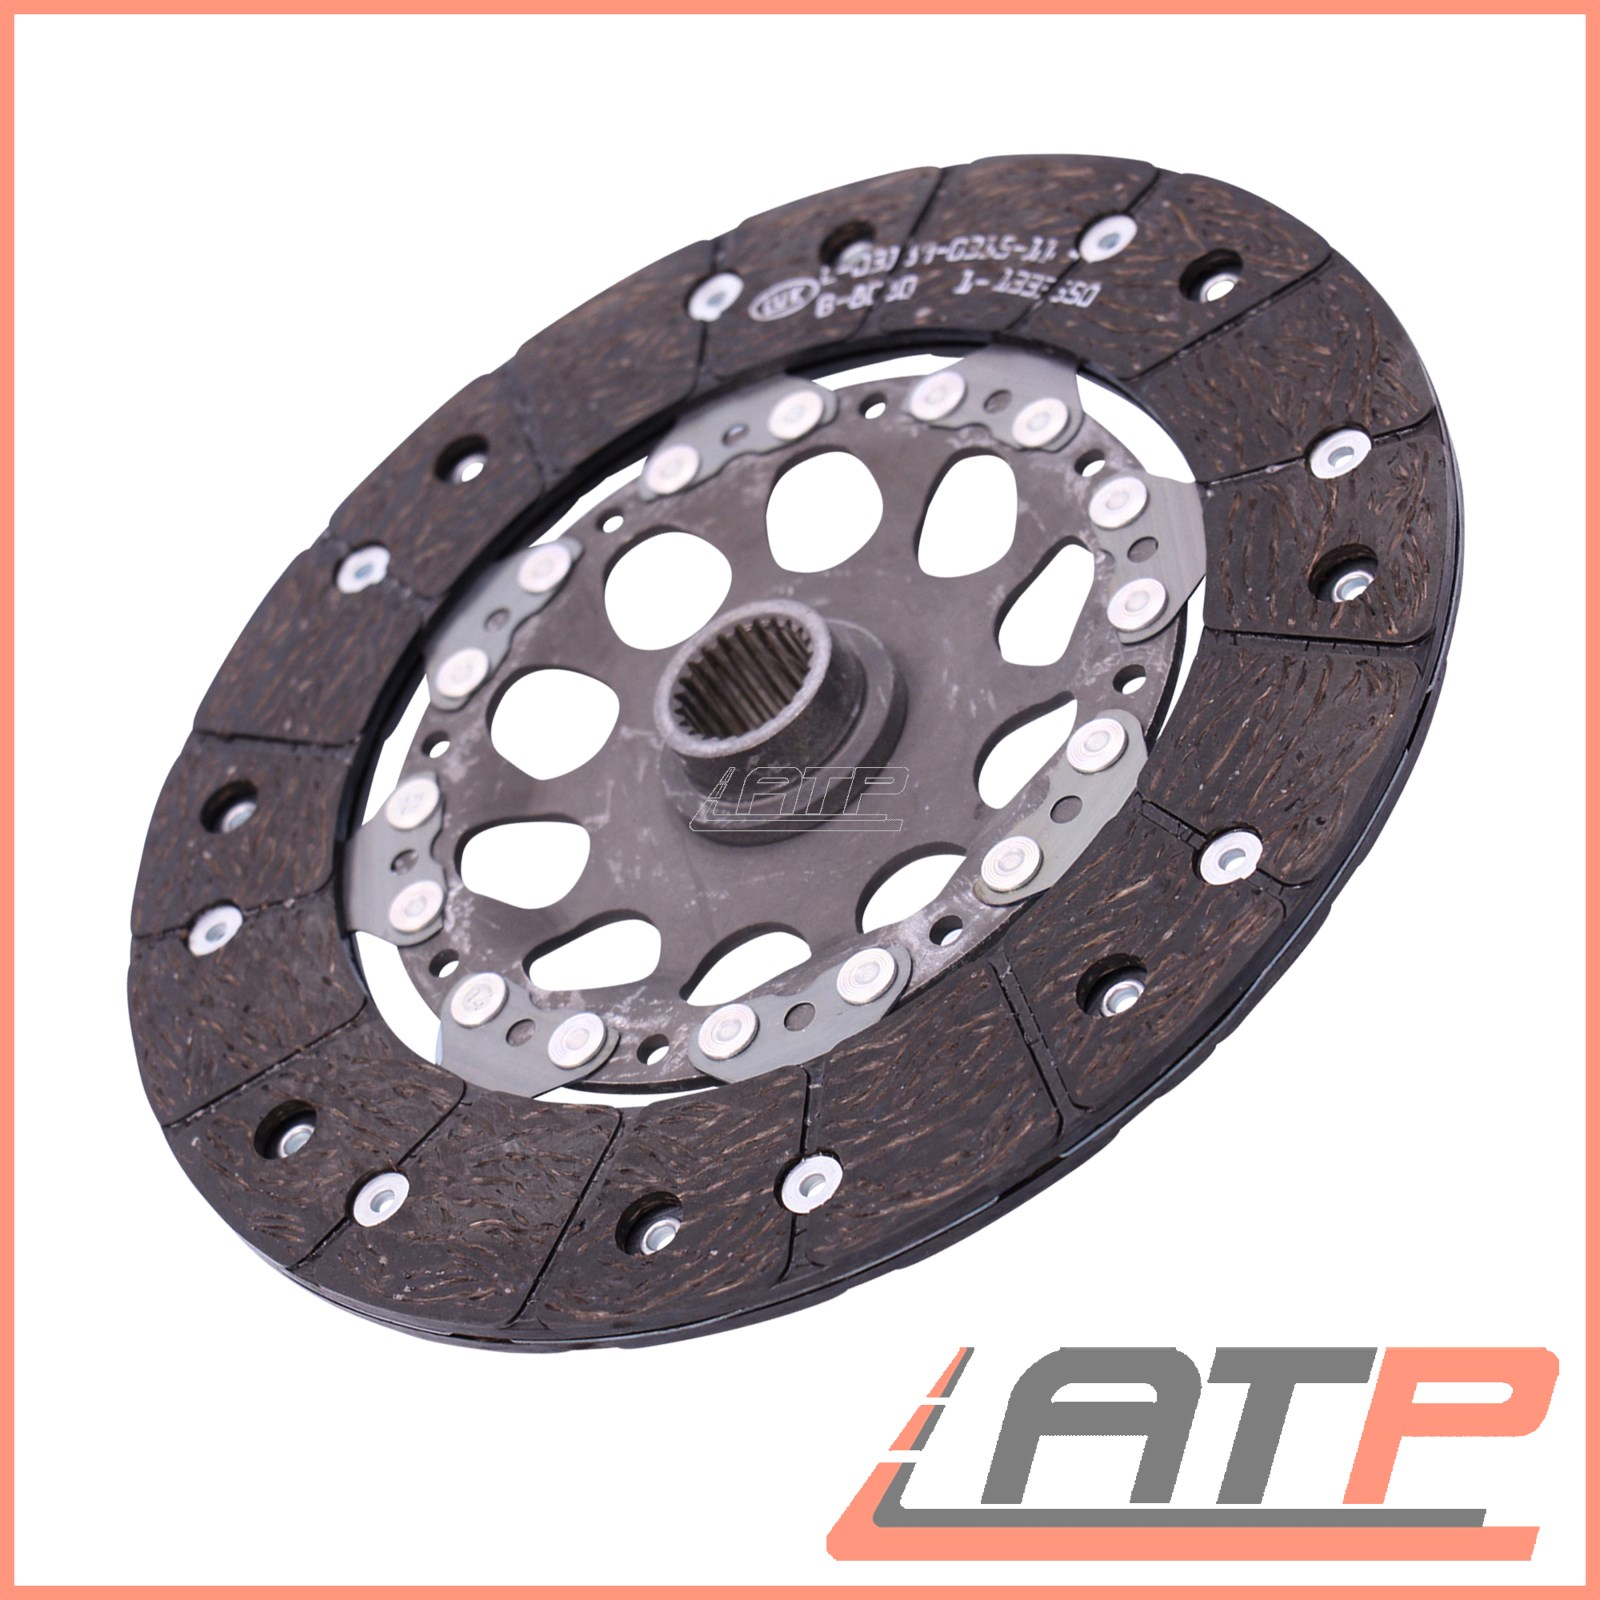 1x genuine luk clutch kit incl dual mass flywheel clamping screws